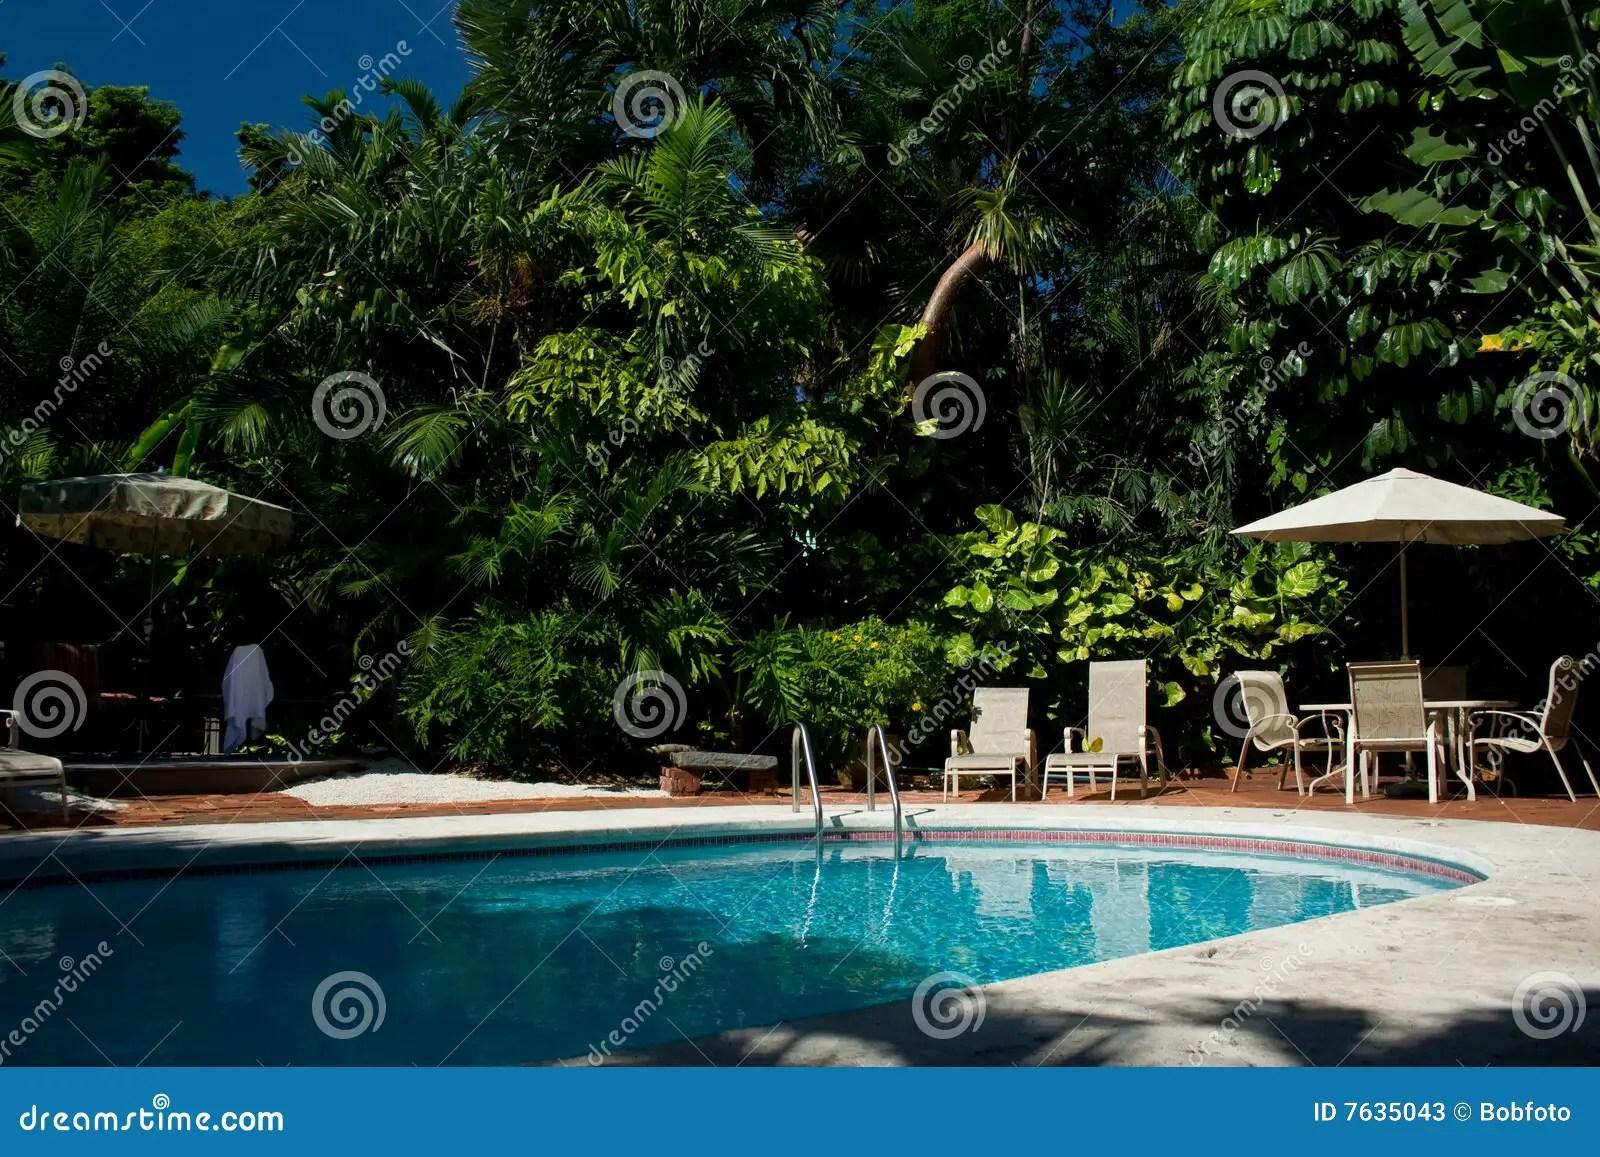 Backyard Pool With Palm Trees Stock Image Image 7635043